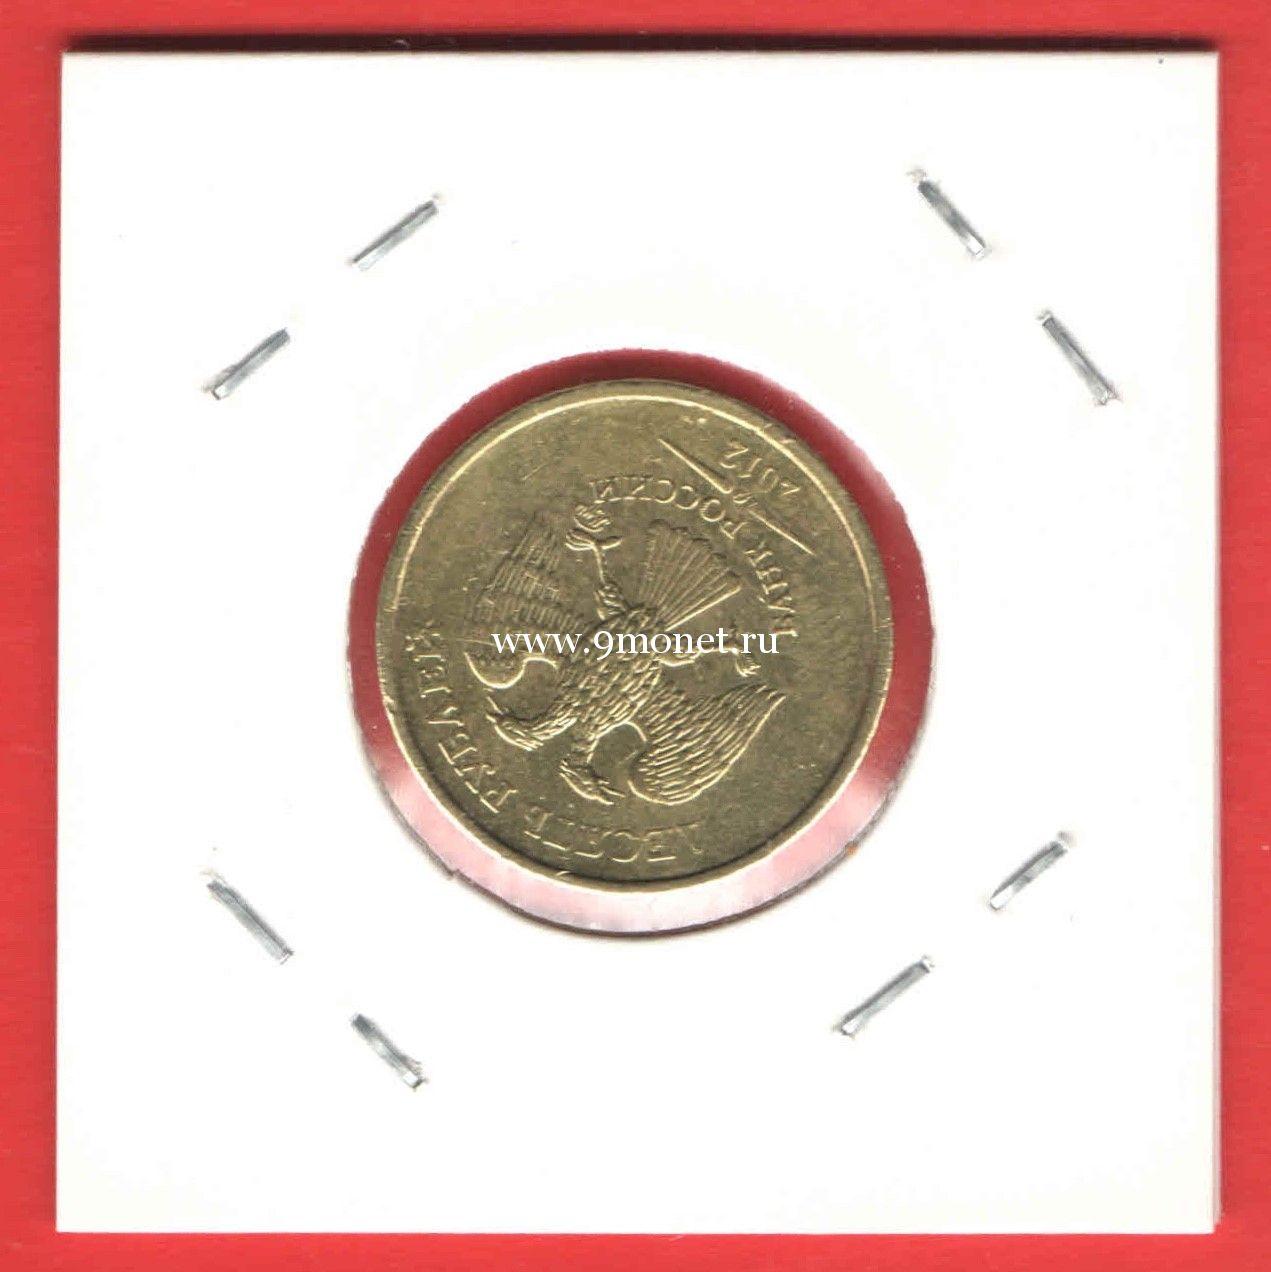 Россия монета с браком 10 рублей 2012 года ММД. (поворот)